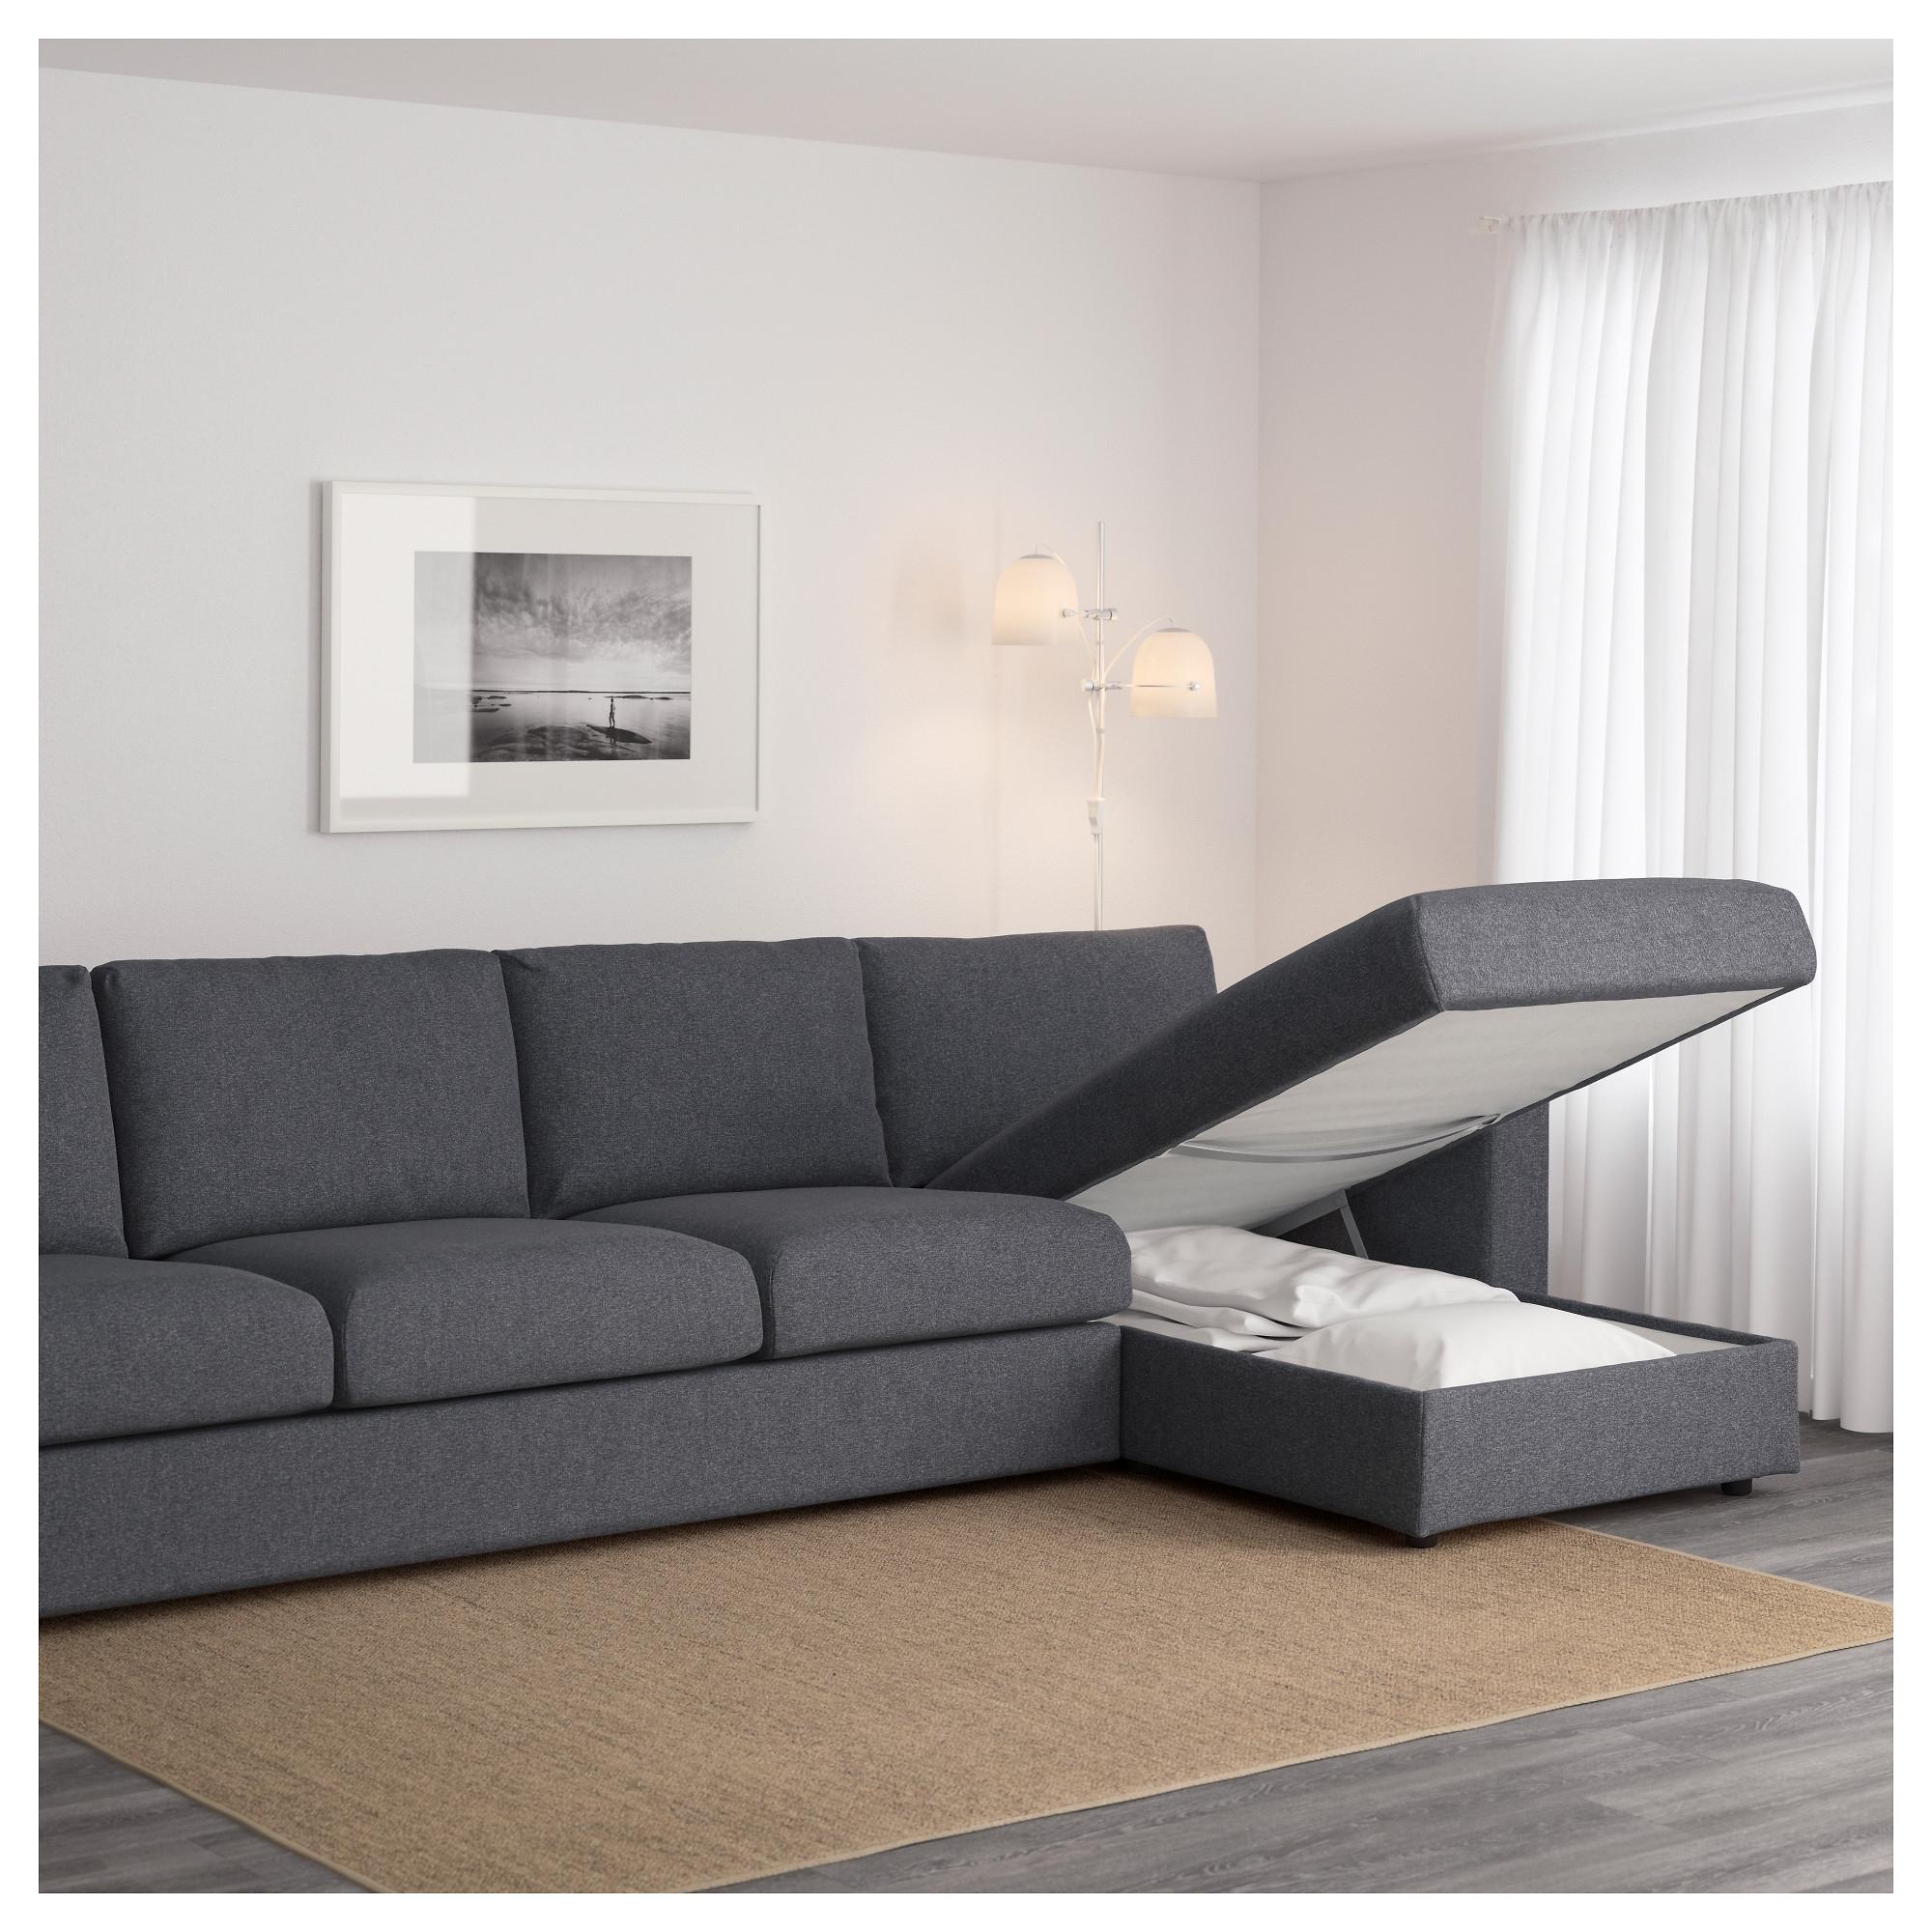 Most Popular 4 Seater Sofas Regarding Vimle 4 Seat Sofa With Chaise Longue/gunnared Medium Grey – Ikea (View 14 of 20)